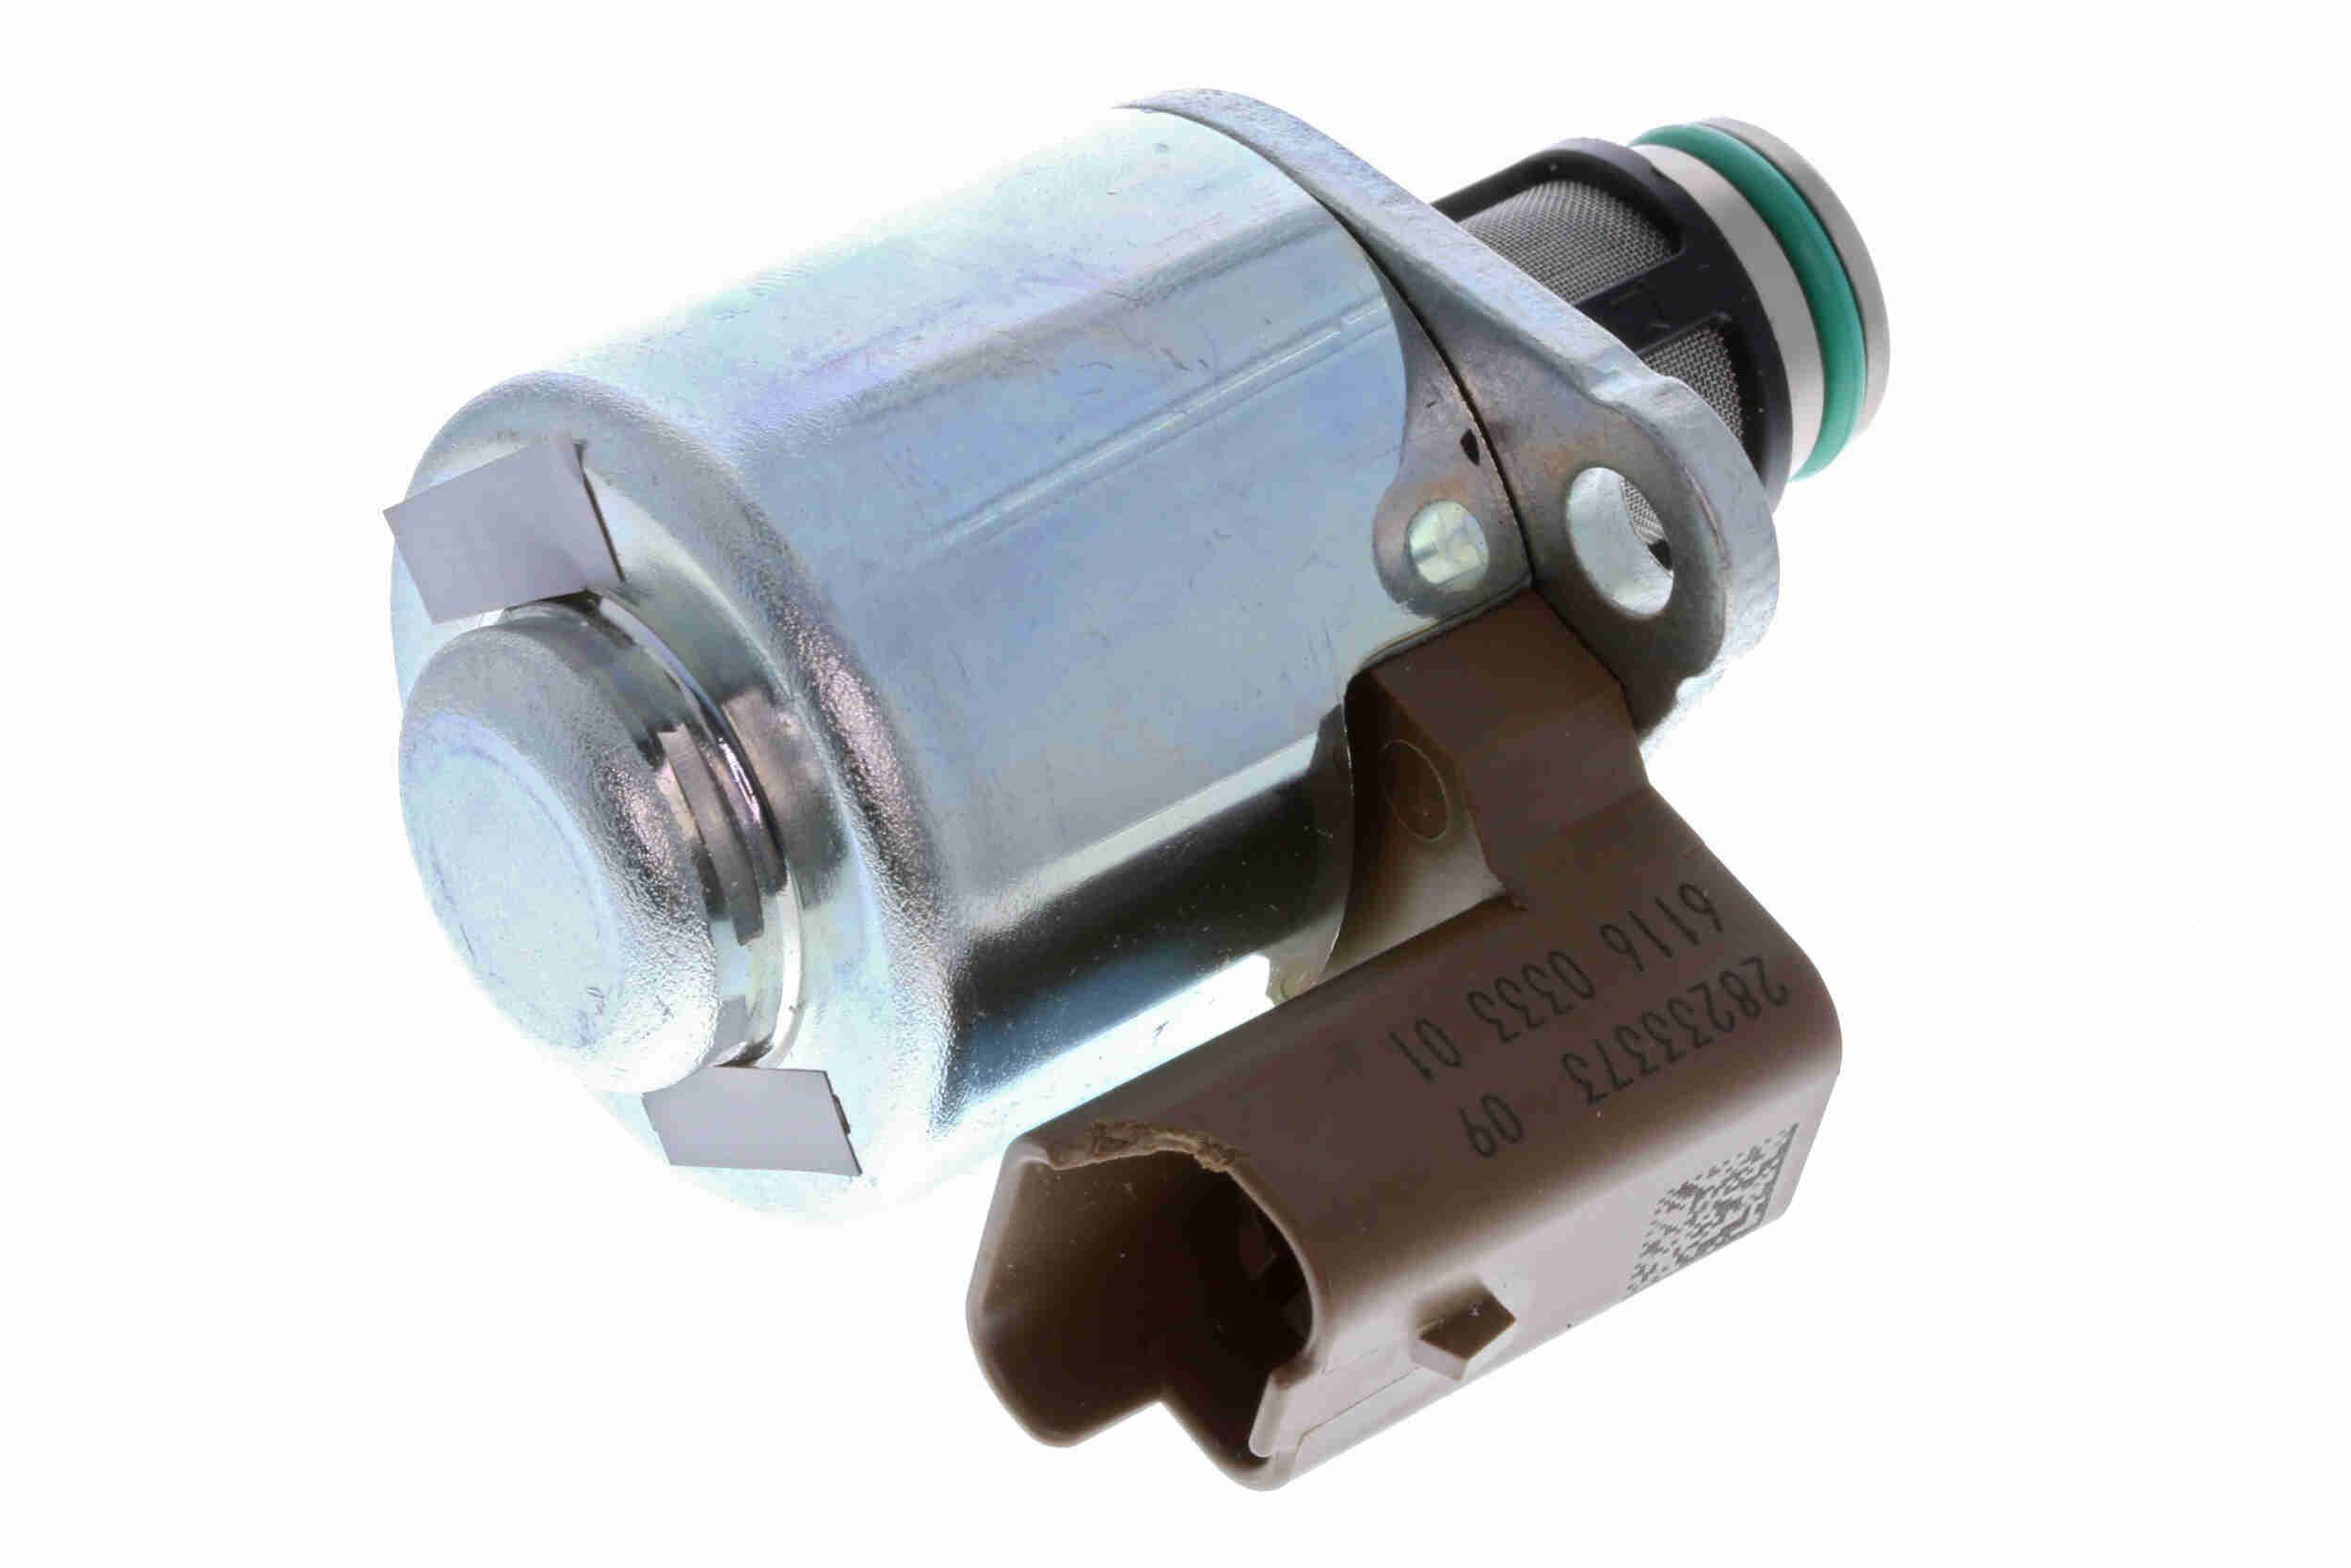 V25-11-0001 Regelventil, Kraftstoffdruck VEMO Erfahrung